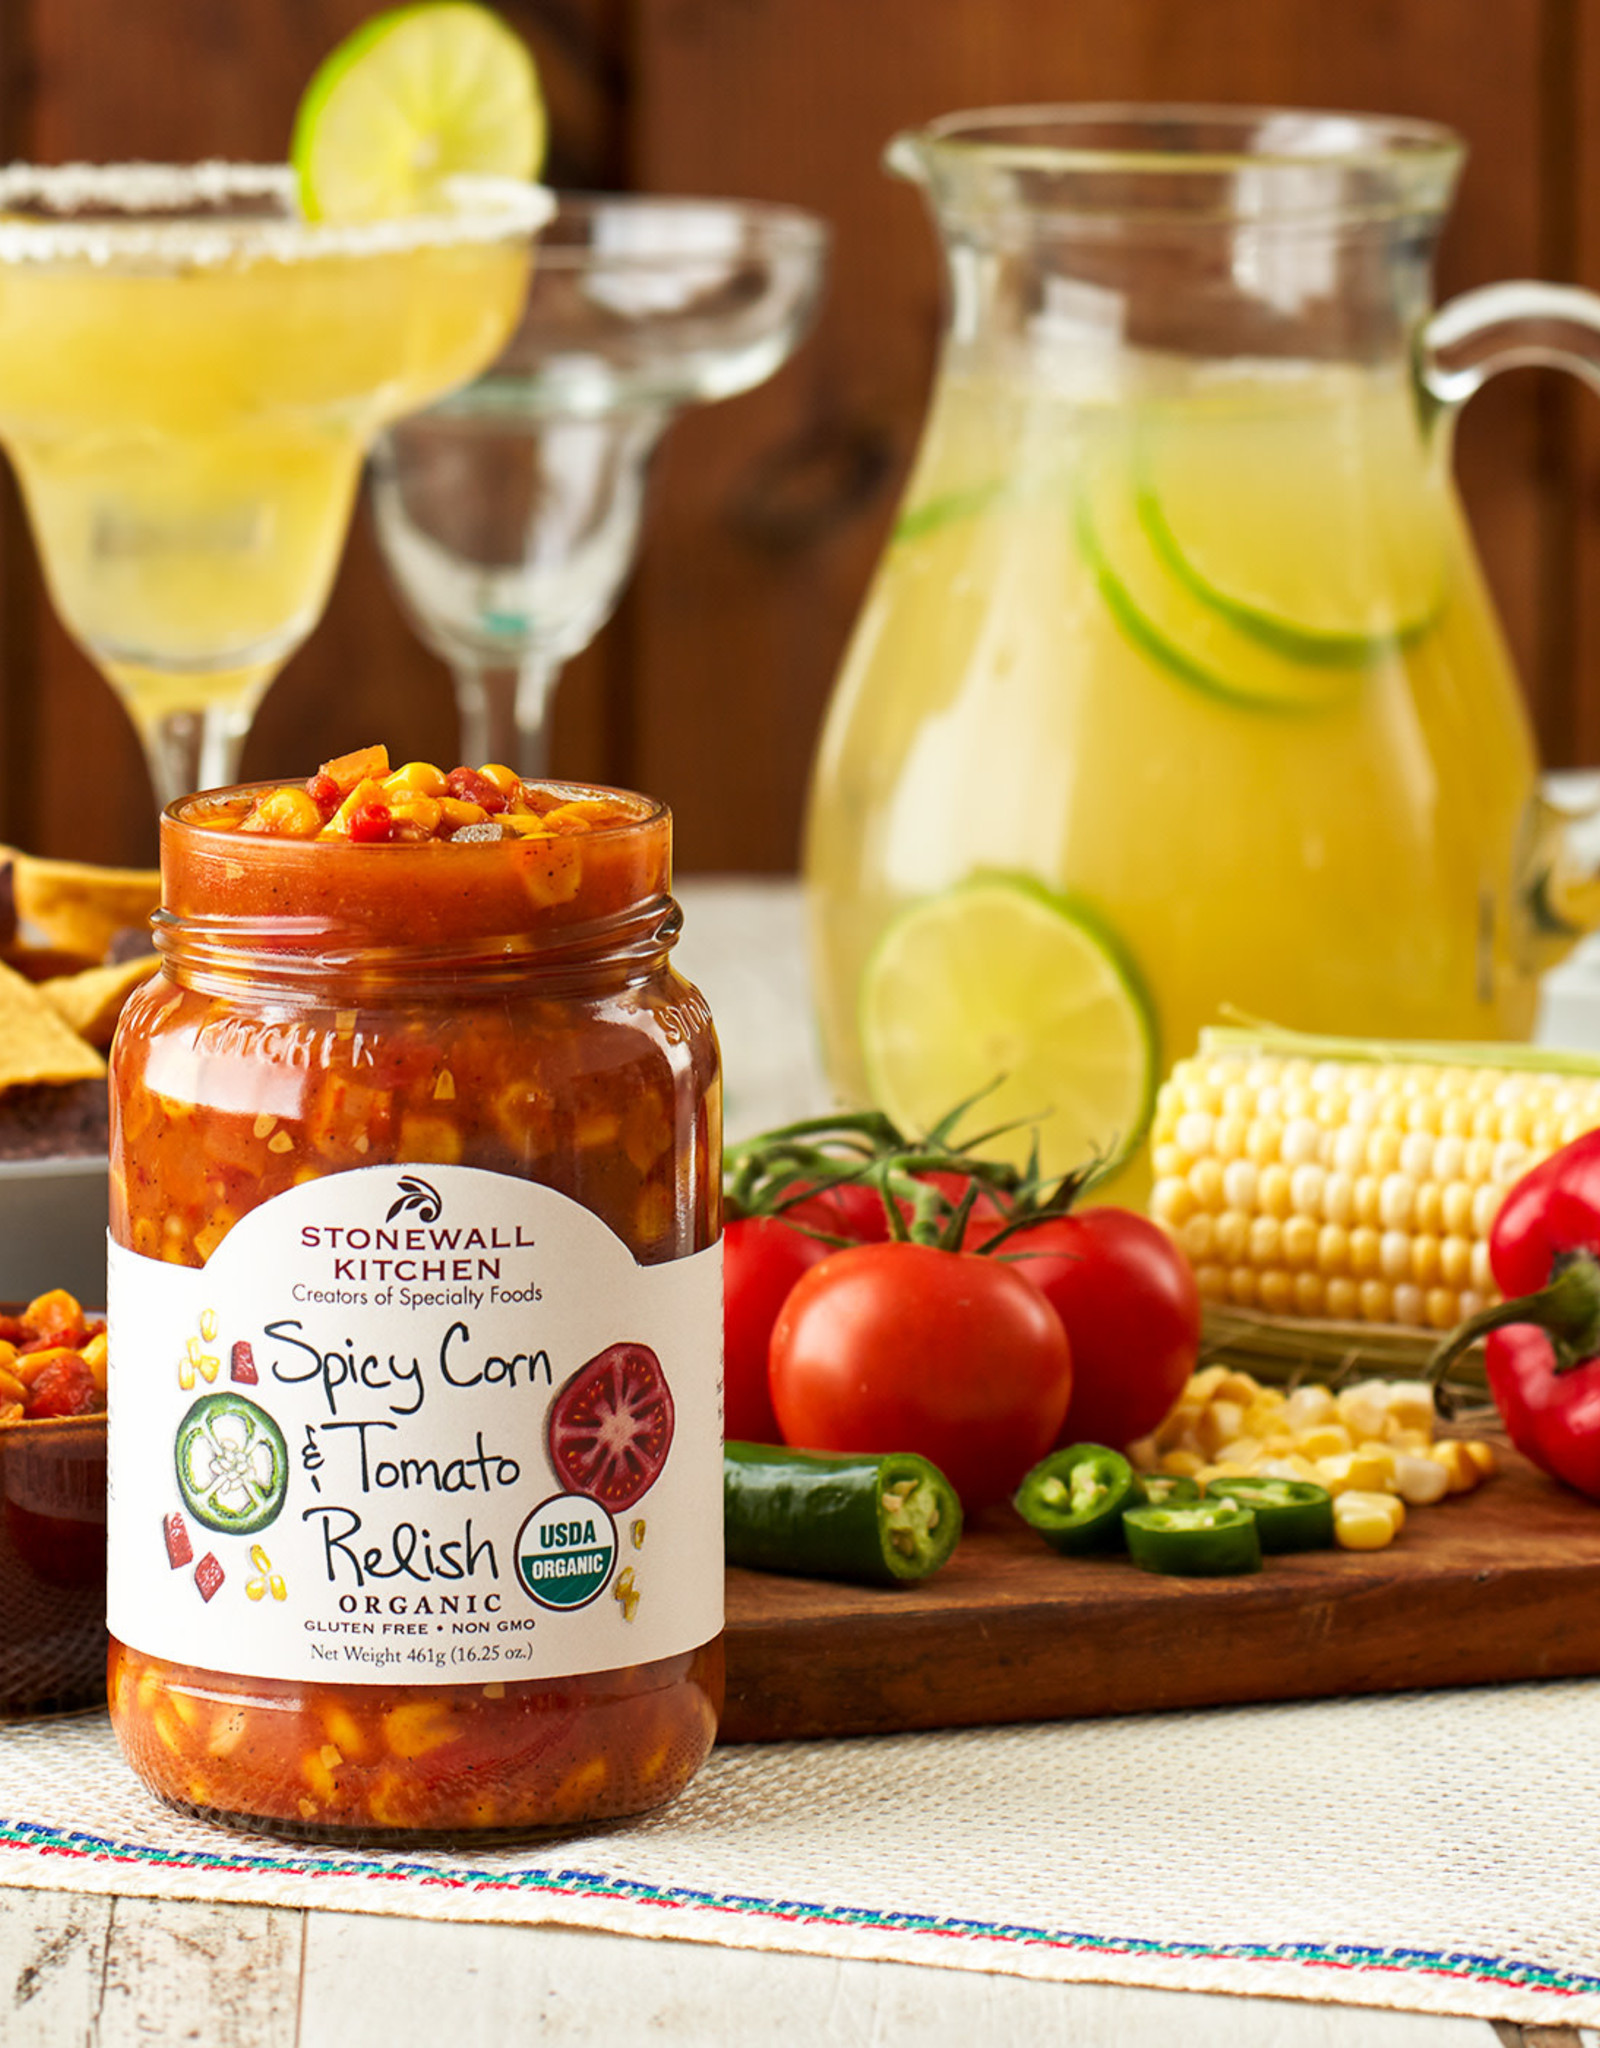 Stonewall Kitchen Spicy Corn and Tomato Relish